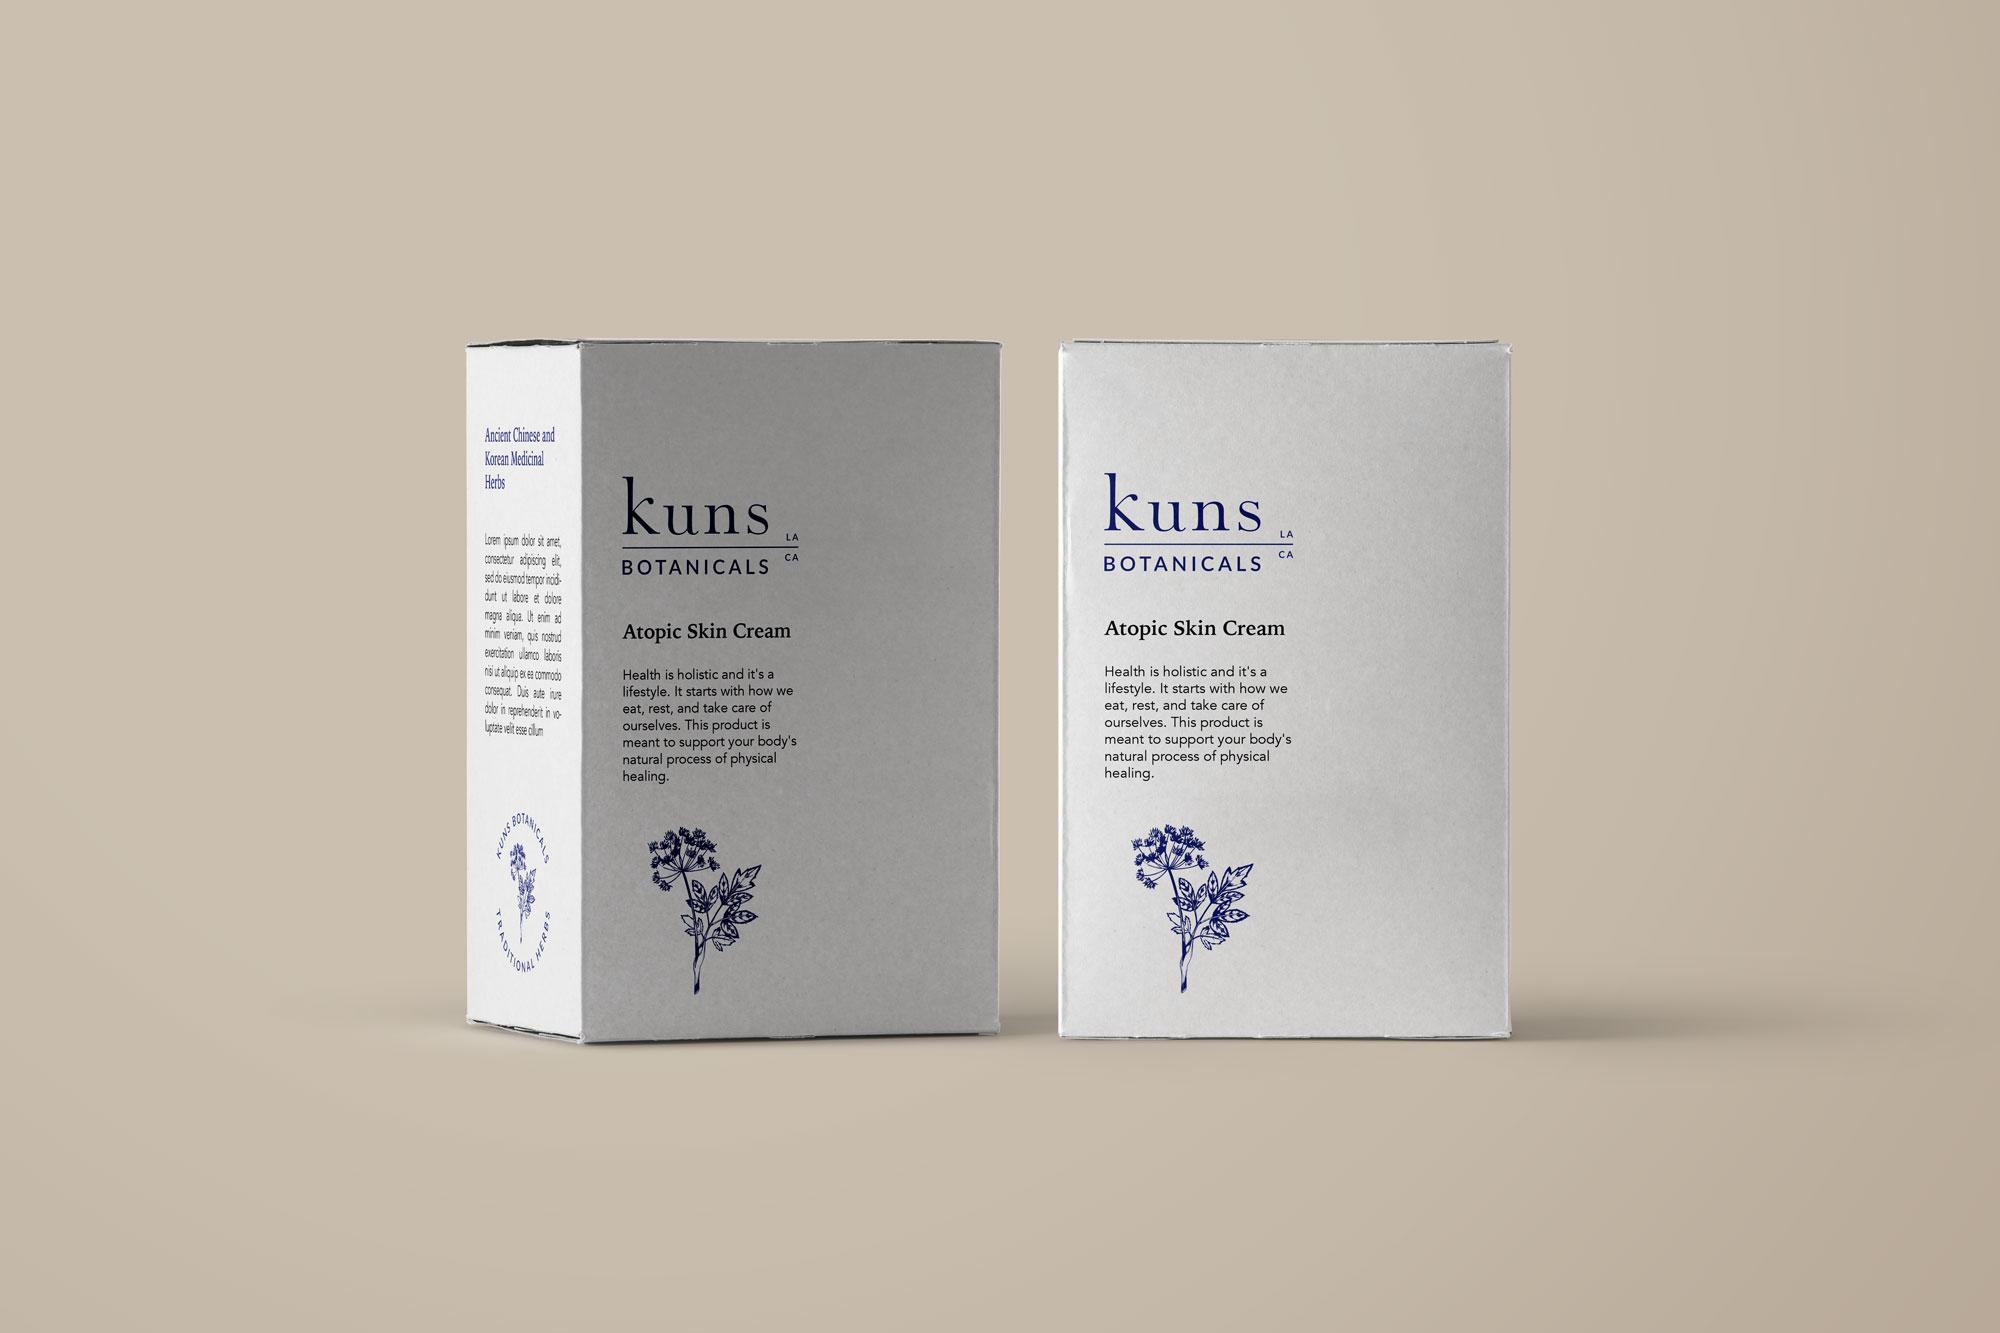 Kuns_Botanicals_PackagingDesign.jpg